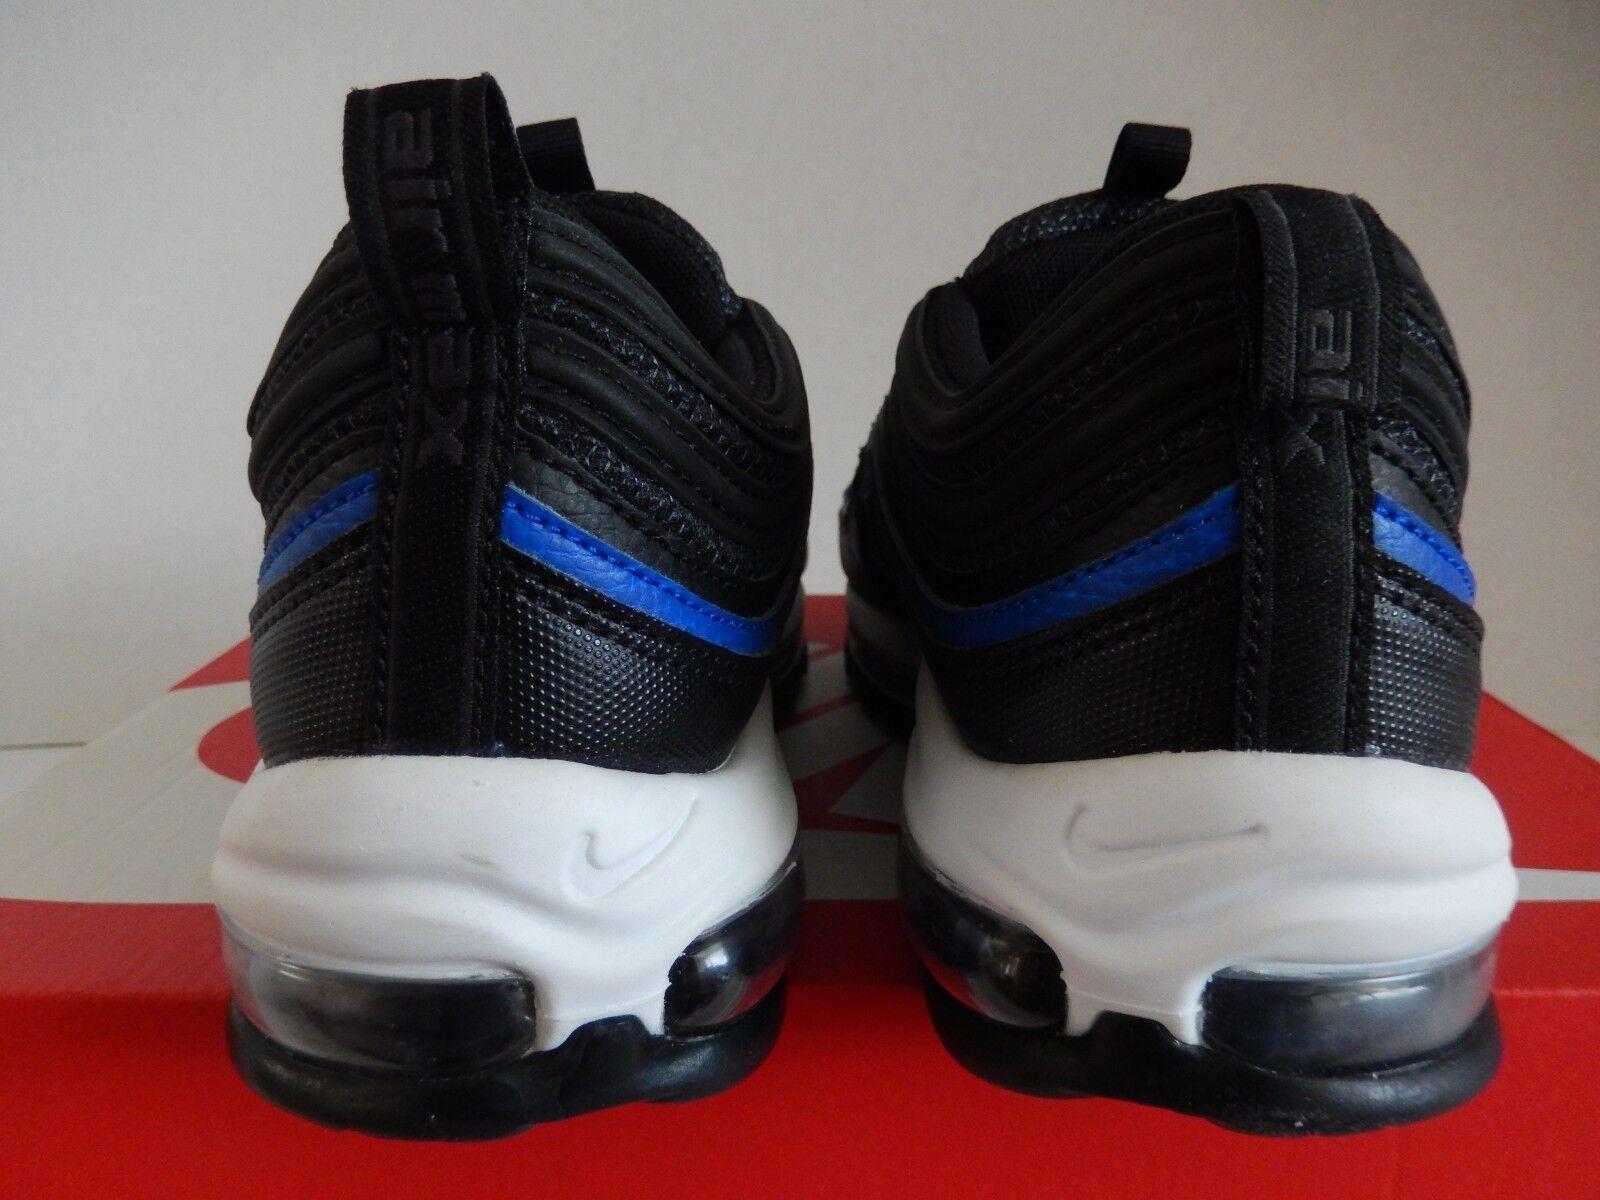 nike air max blaue 97 og anthracite-black-racer blaue max sz 8,5 db40cb